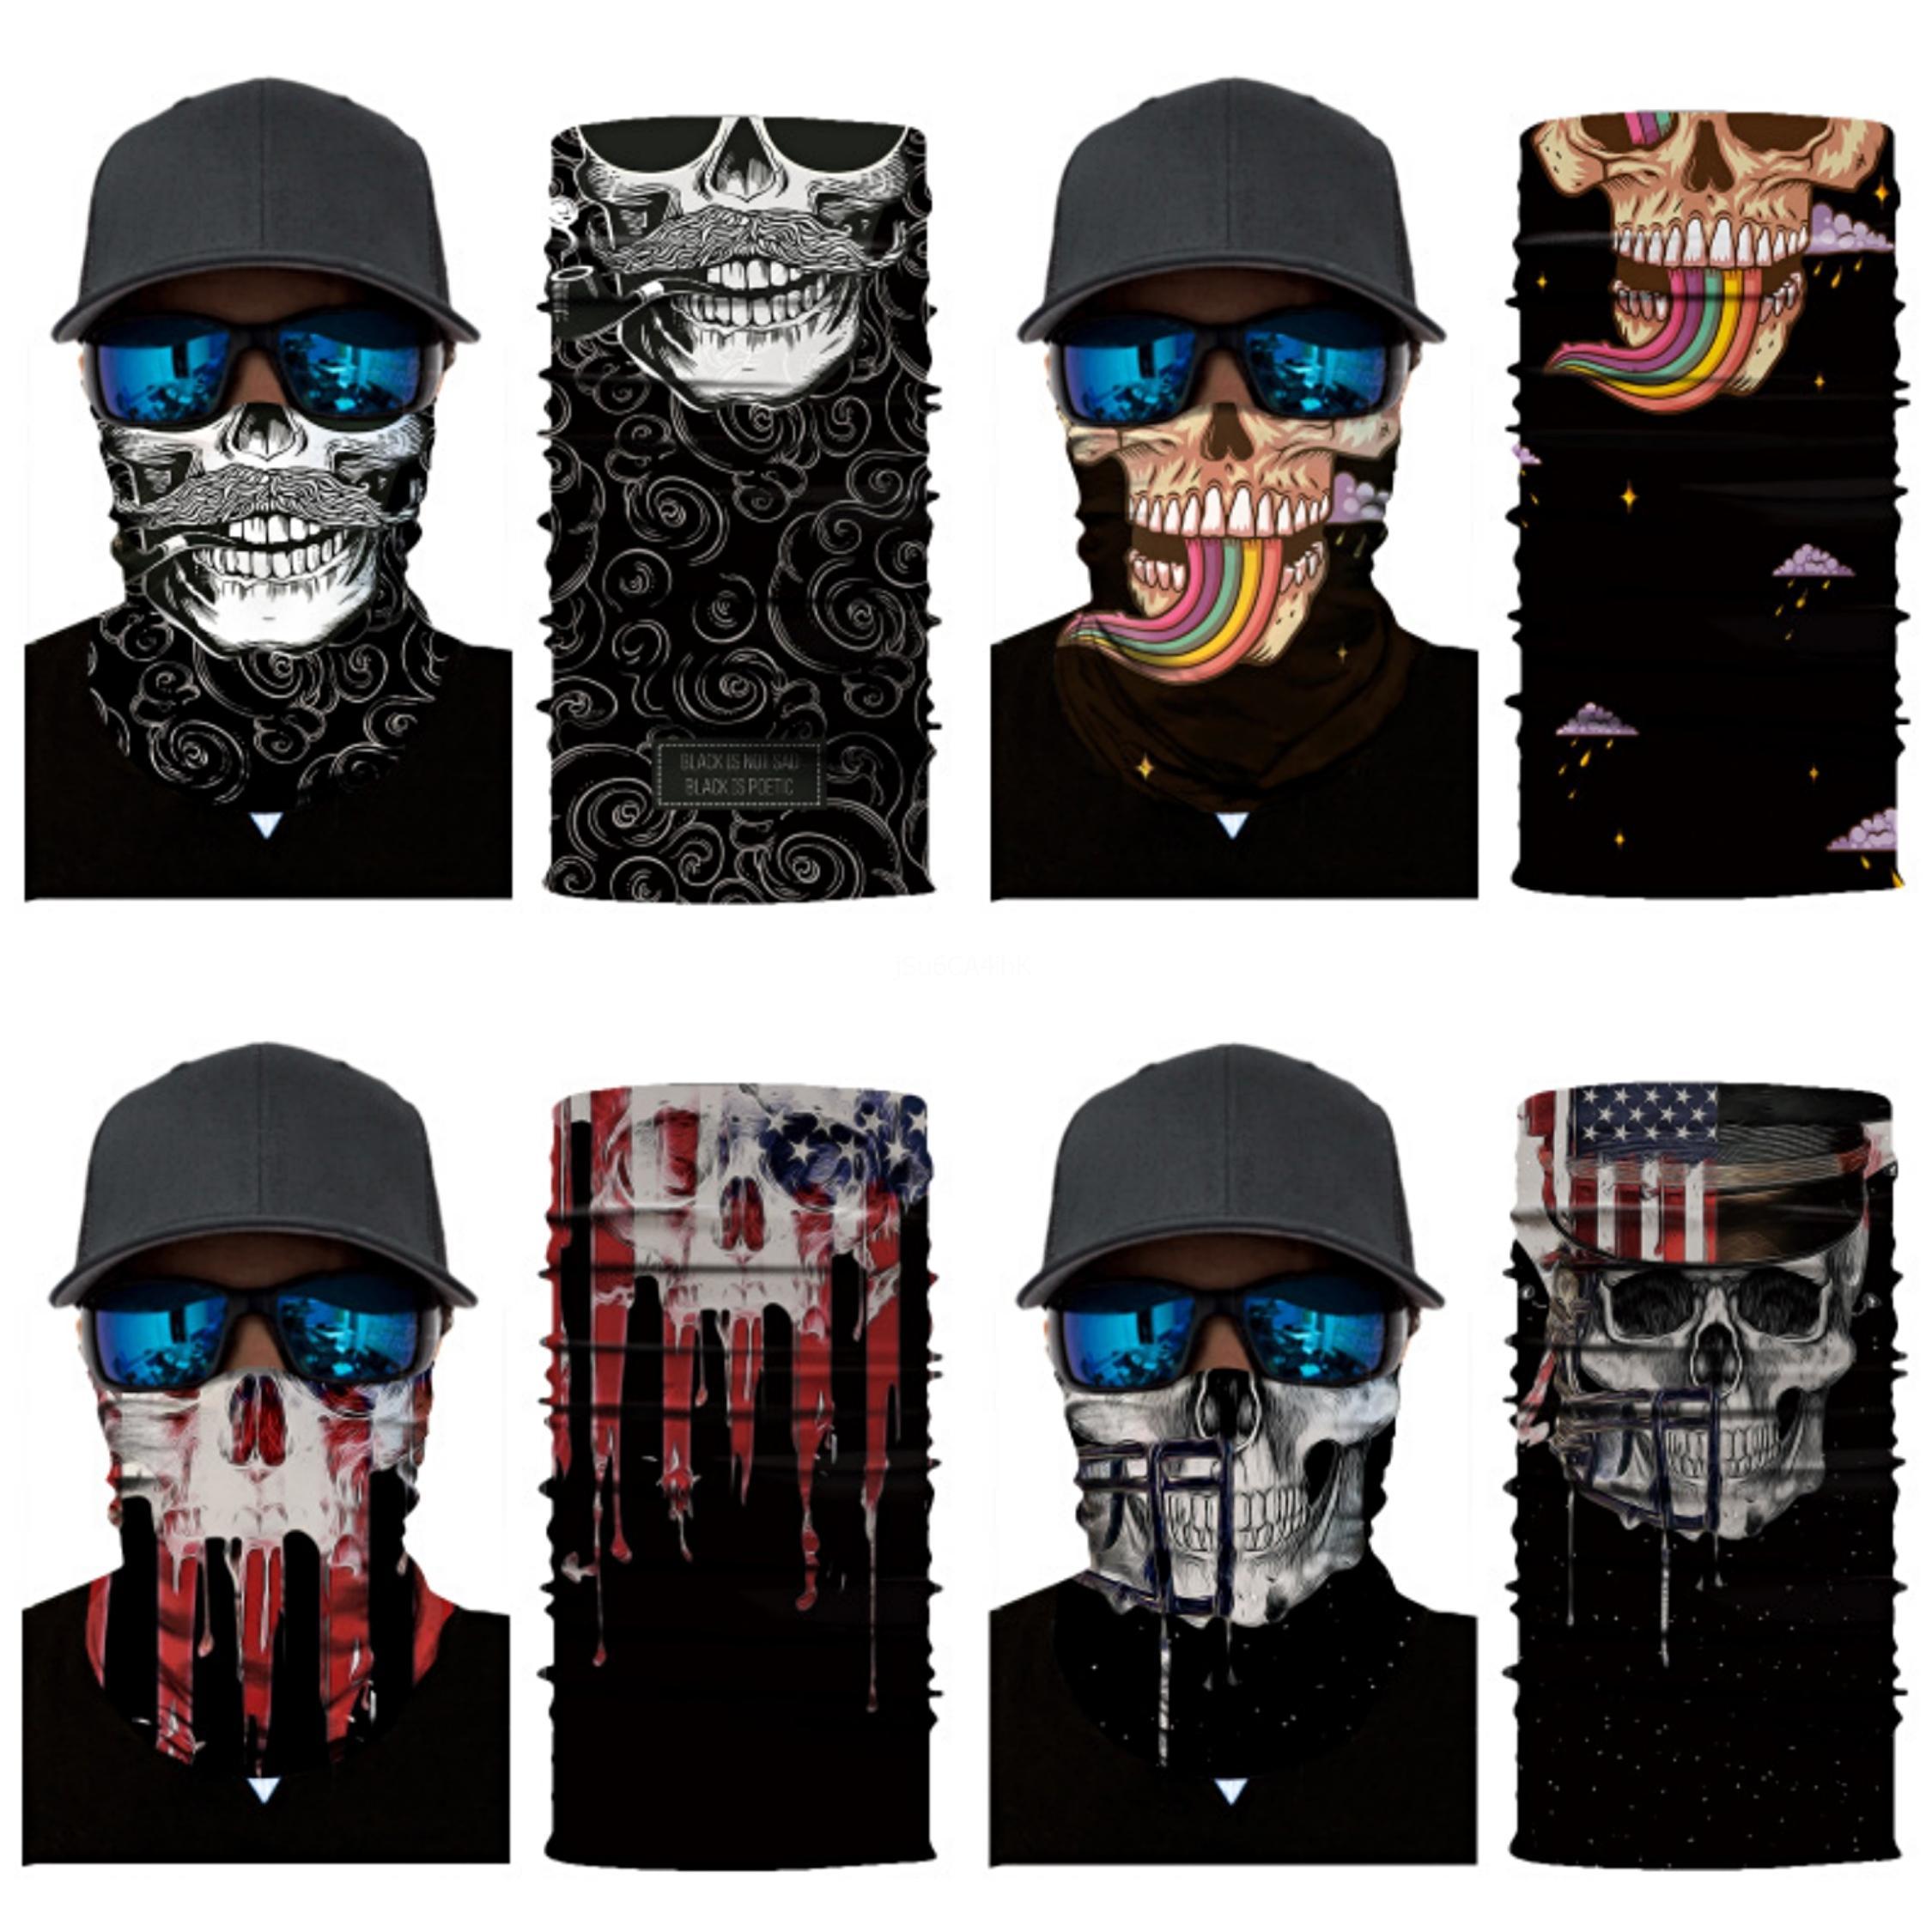 8 estilo máscara da cara do crânio Magia Seamless Skull Scarf ciclismo equitação máscara máscaras festa ao ar livre Skerchief Y1I33 # 204 # 826